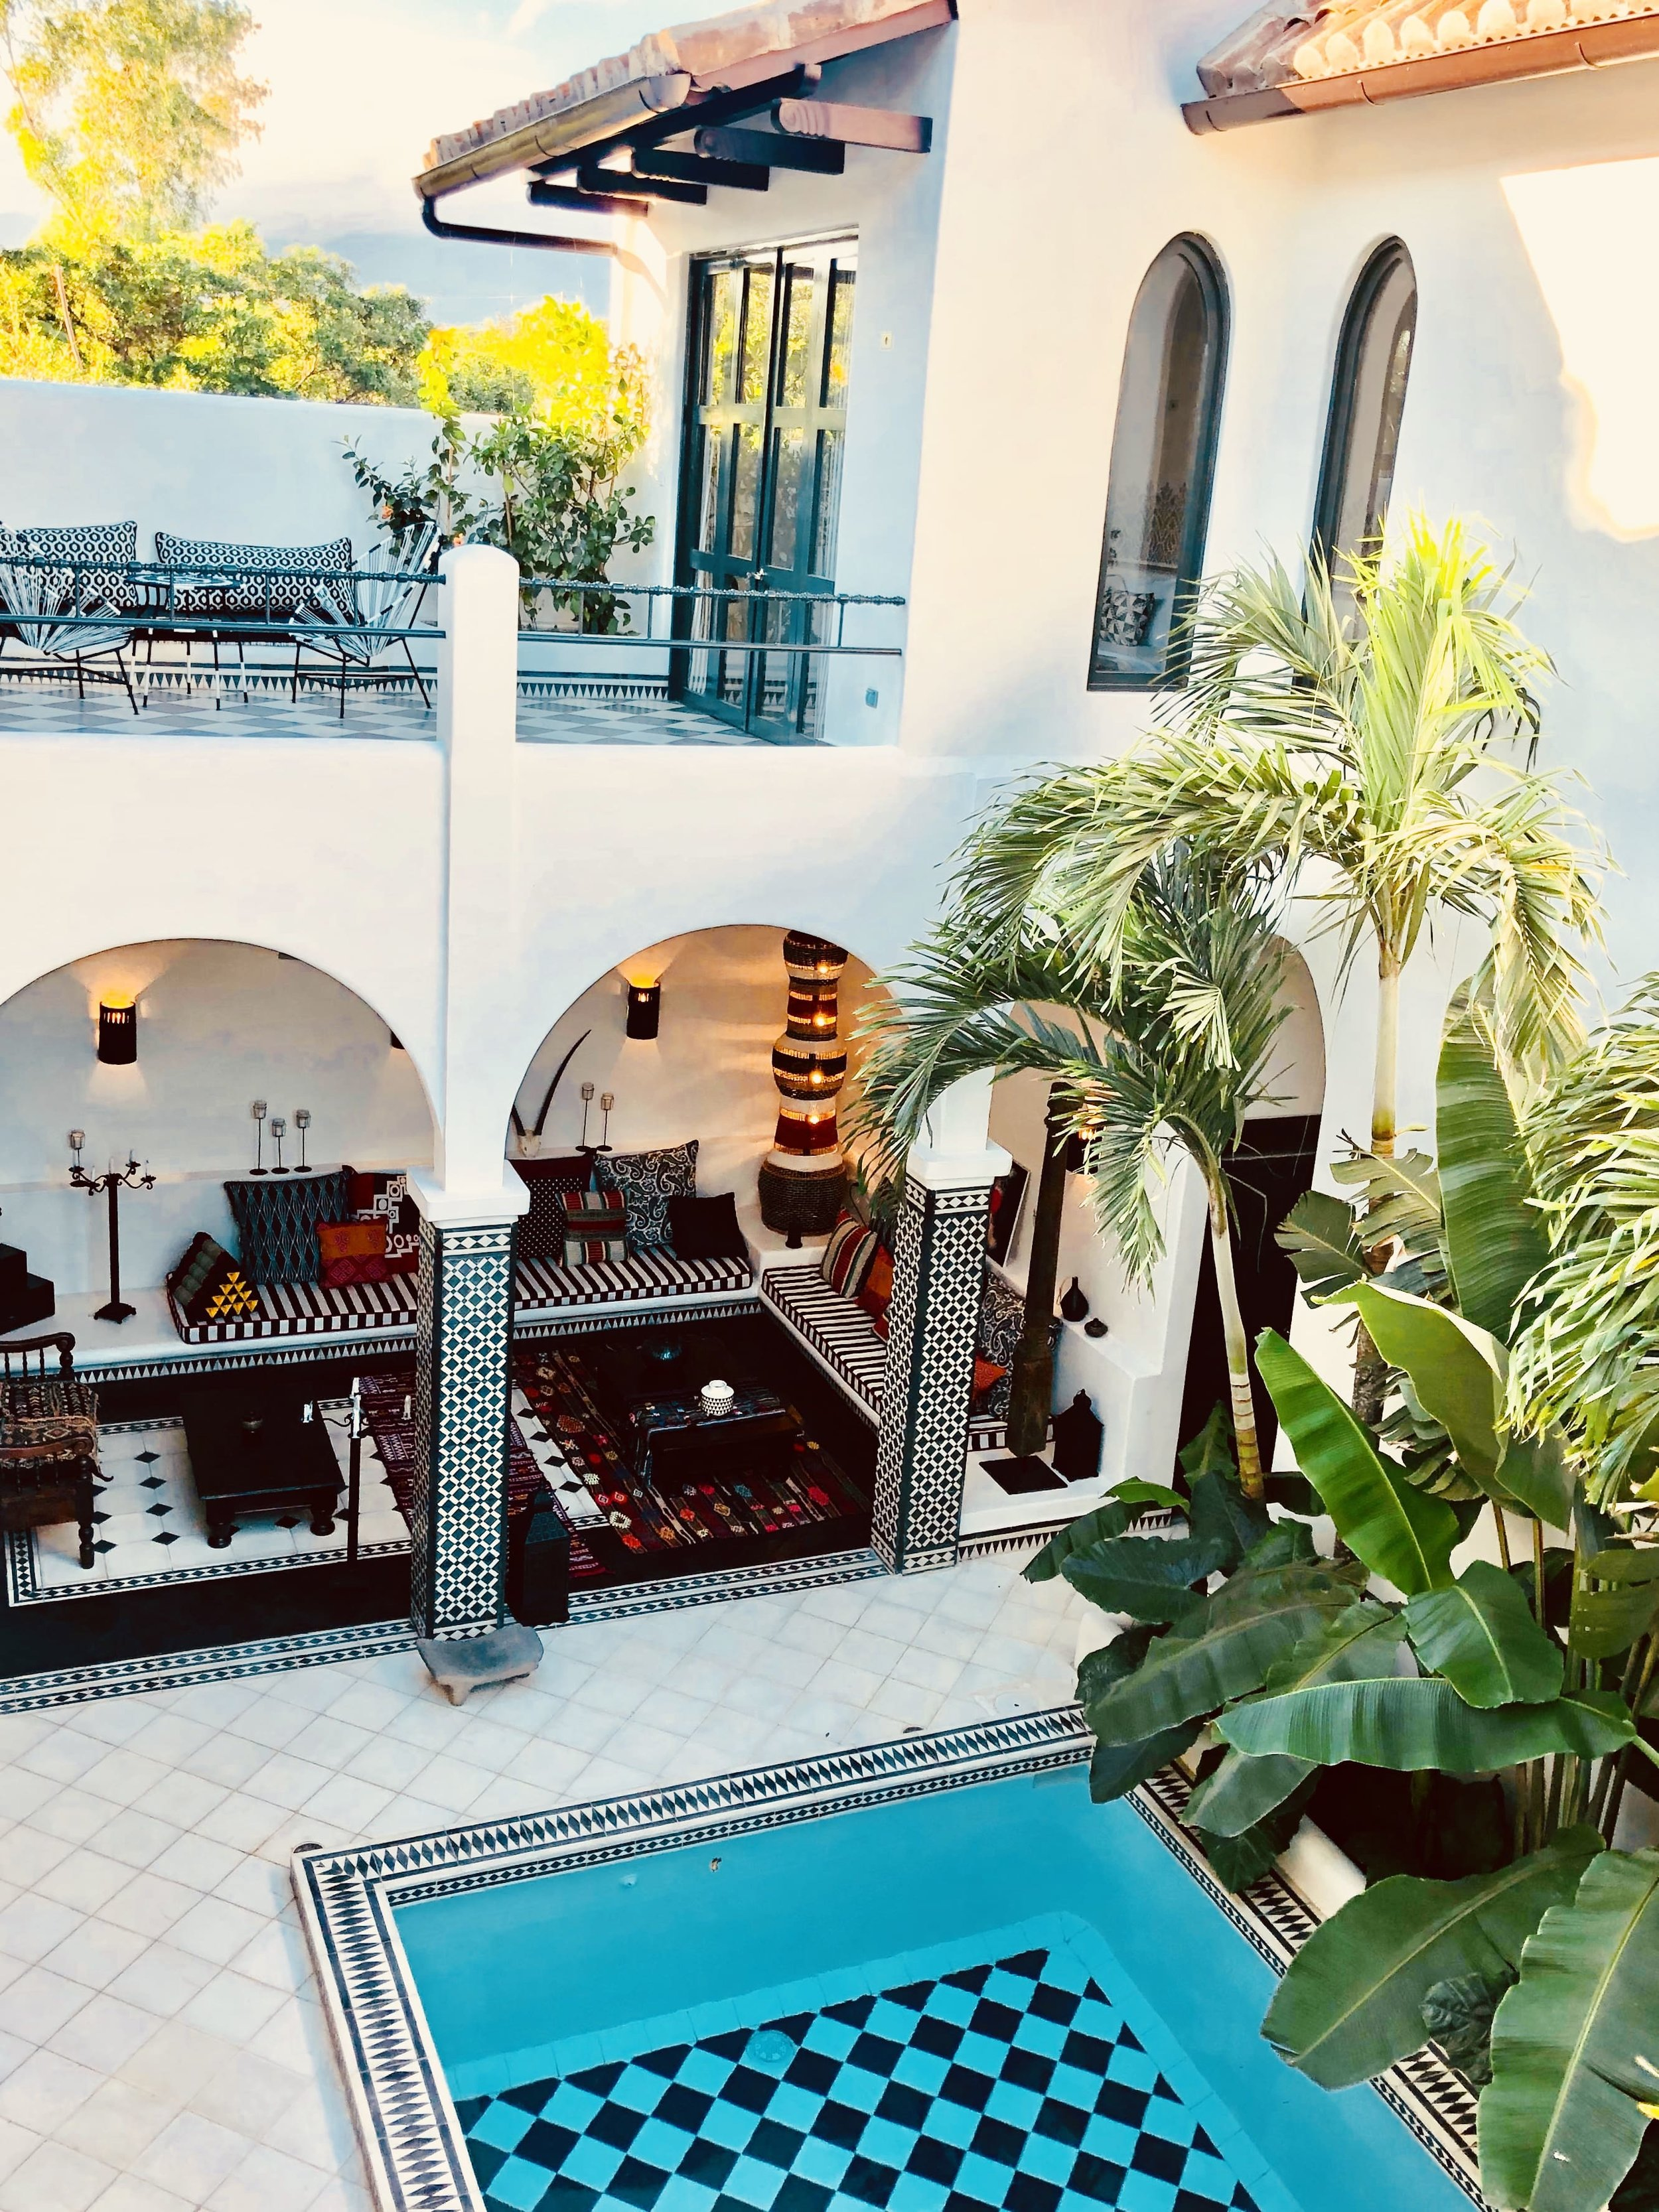 Real Estate For Sale Granada Nicaragua 10-min.jpeg